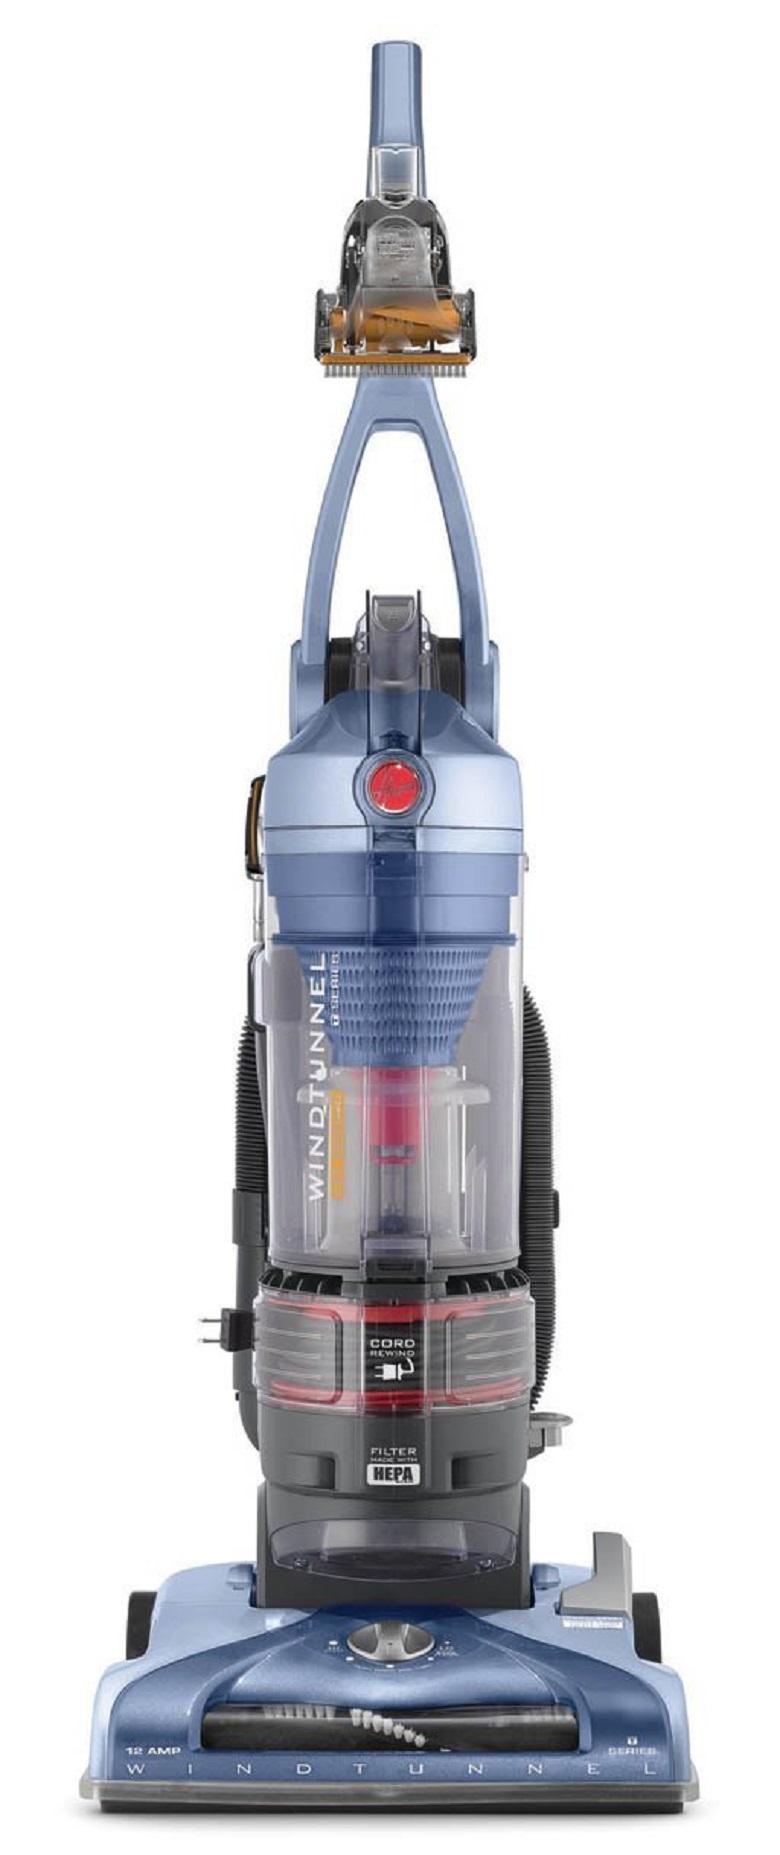 Hoover T-Series WindTunnel Pet Rewind Bagless Upright Vaccum, UH70210, hoover pet vacuum, pet vacuum